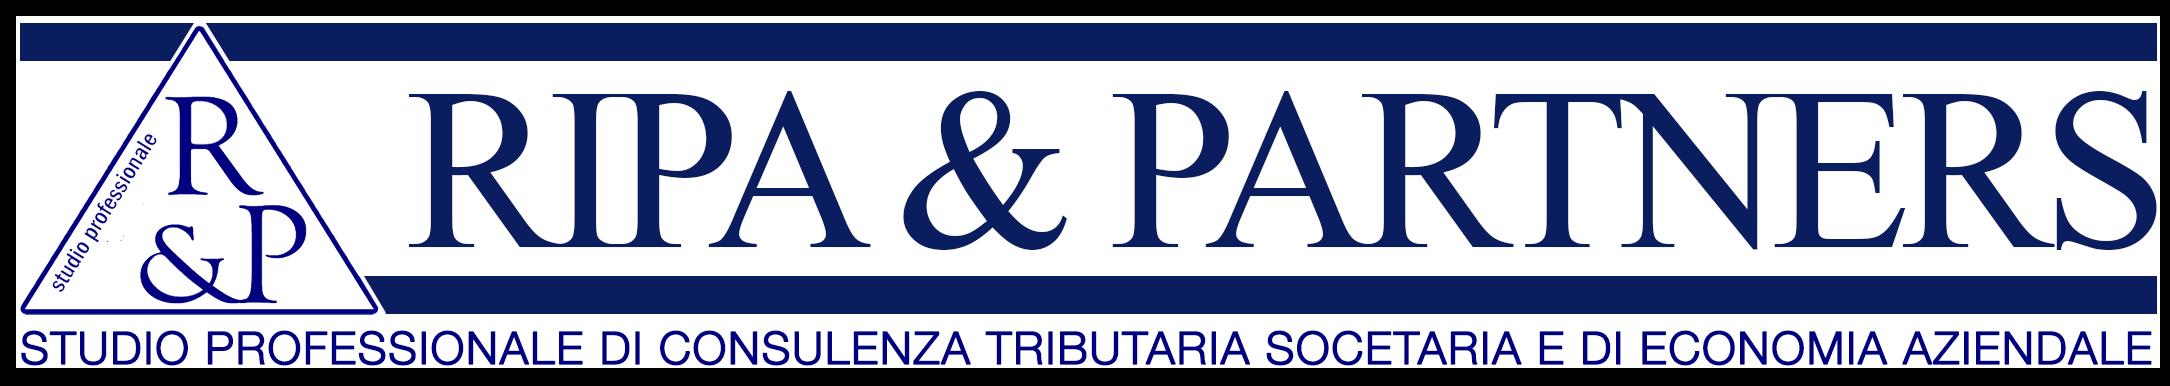 Ripa e Partners_logo